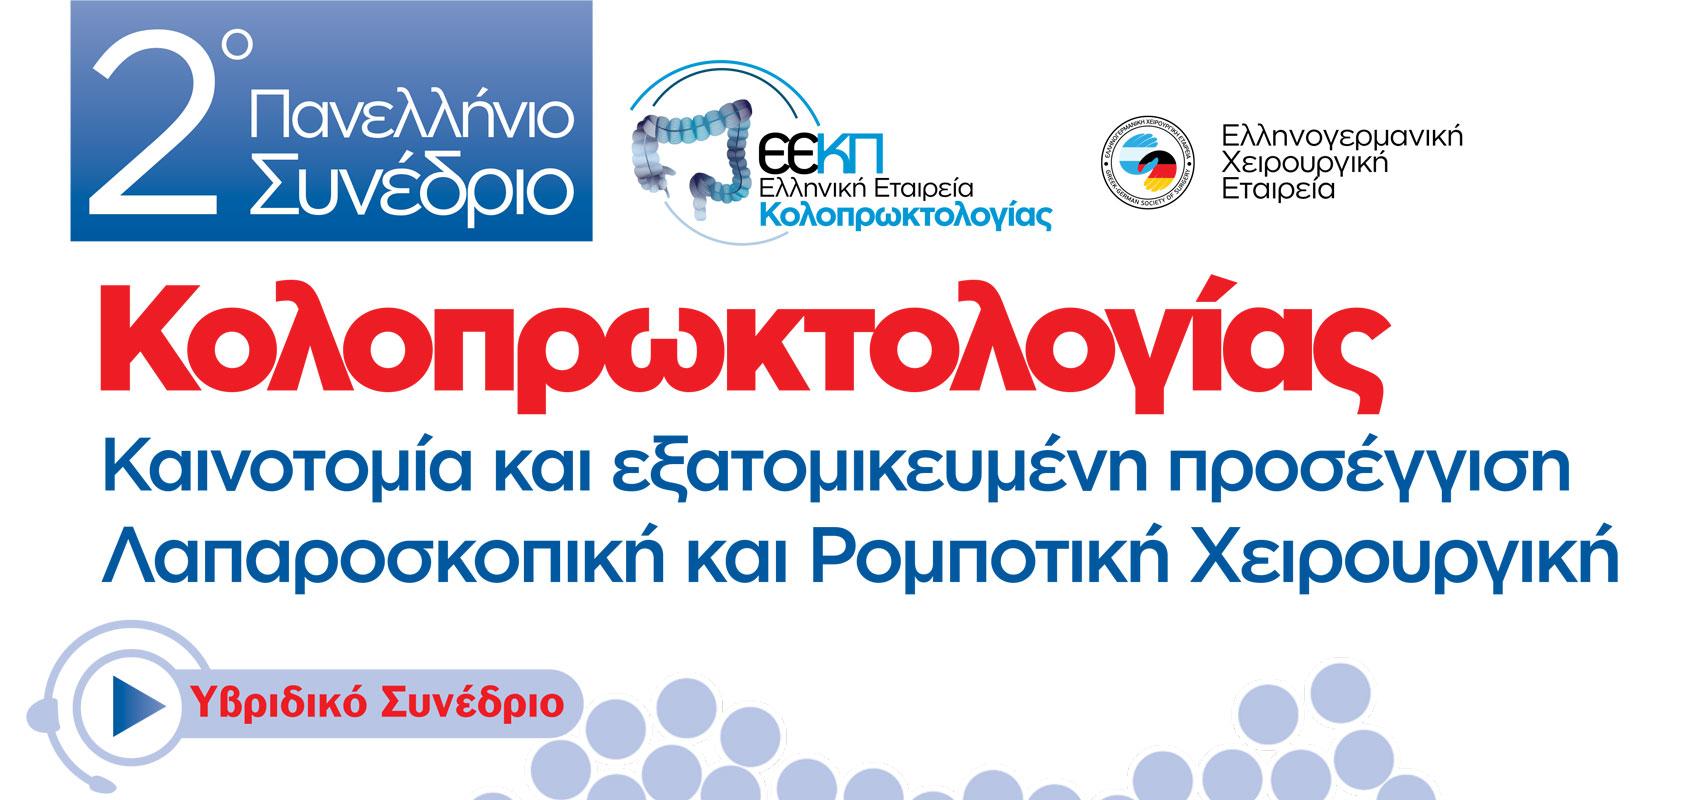 2o Πανελλήνιο Συνέδριο Κολοπρωκτολογίας